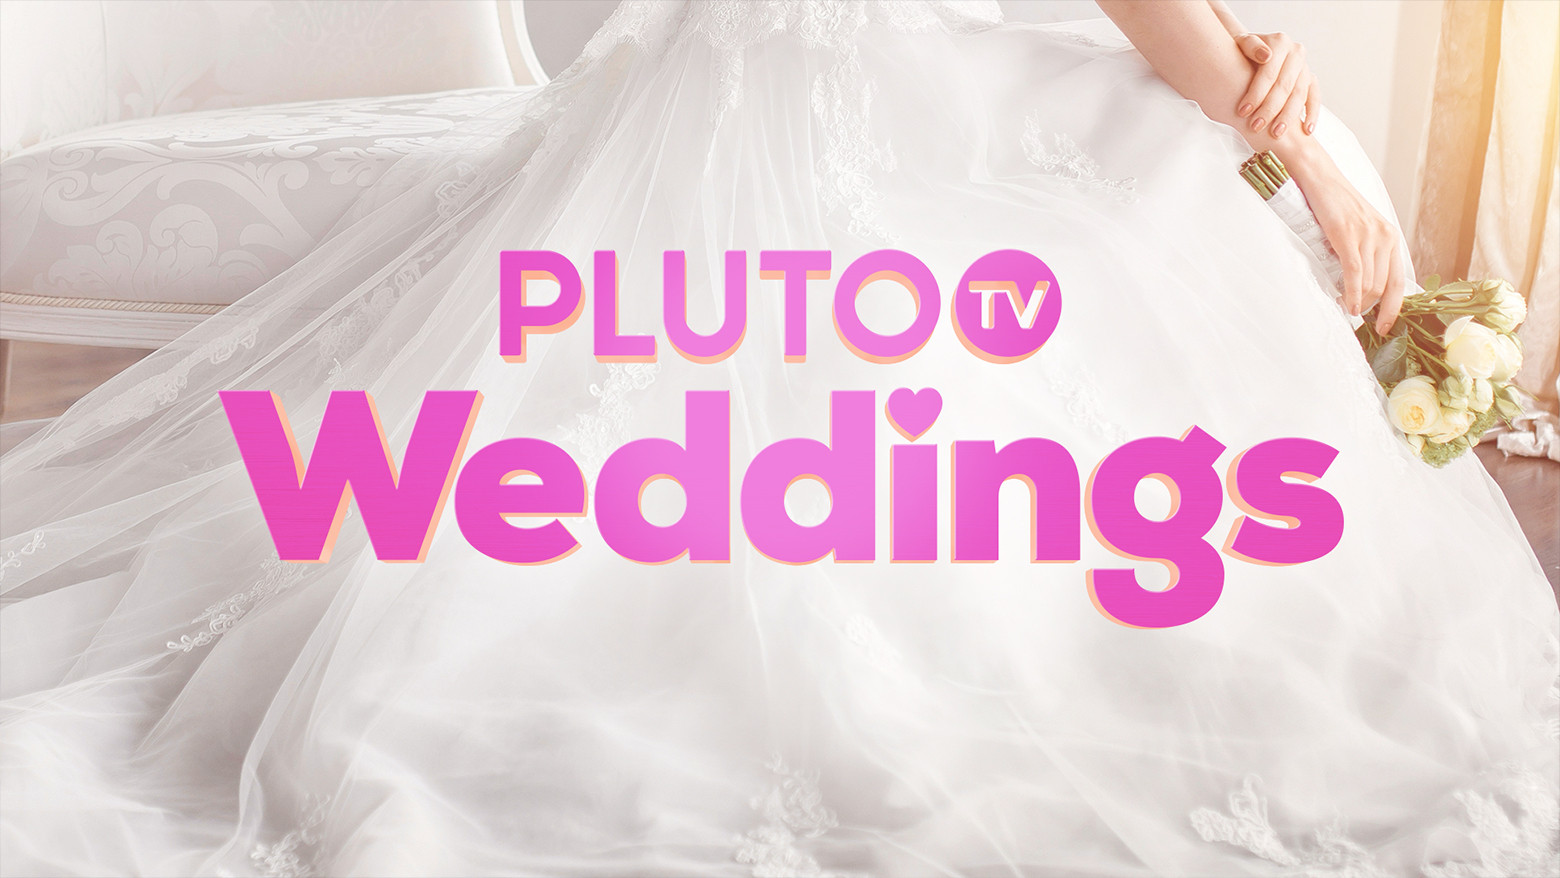 PTV Weddings featuredImage.jpg